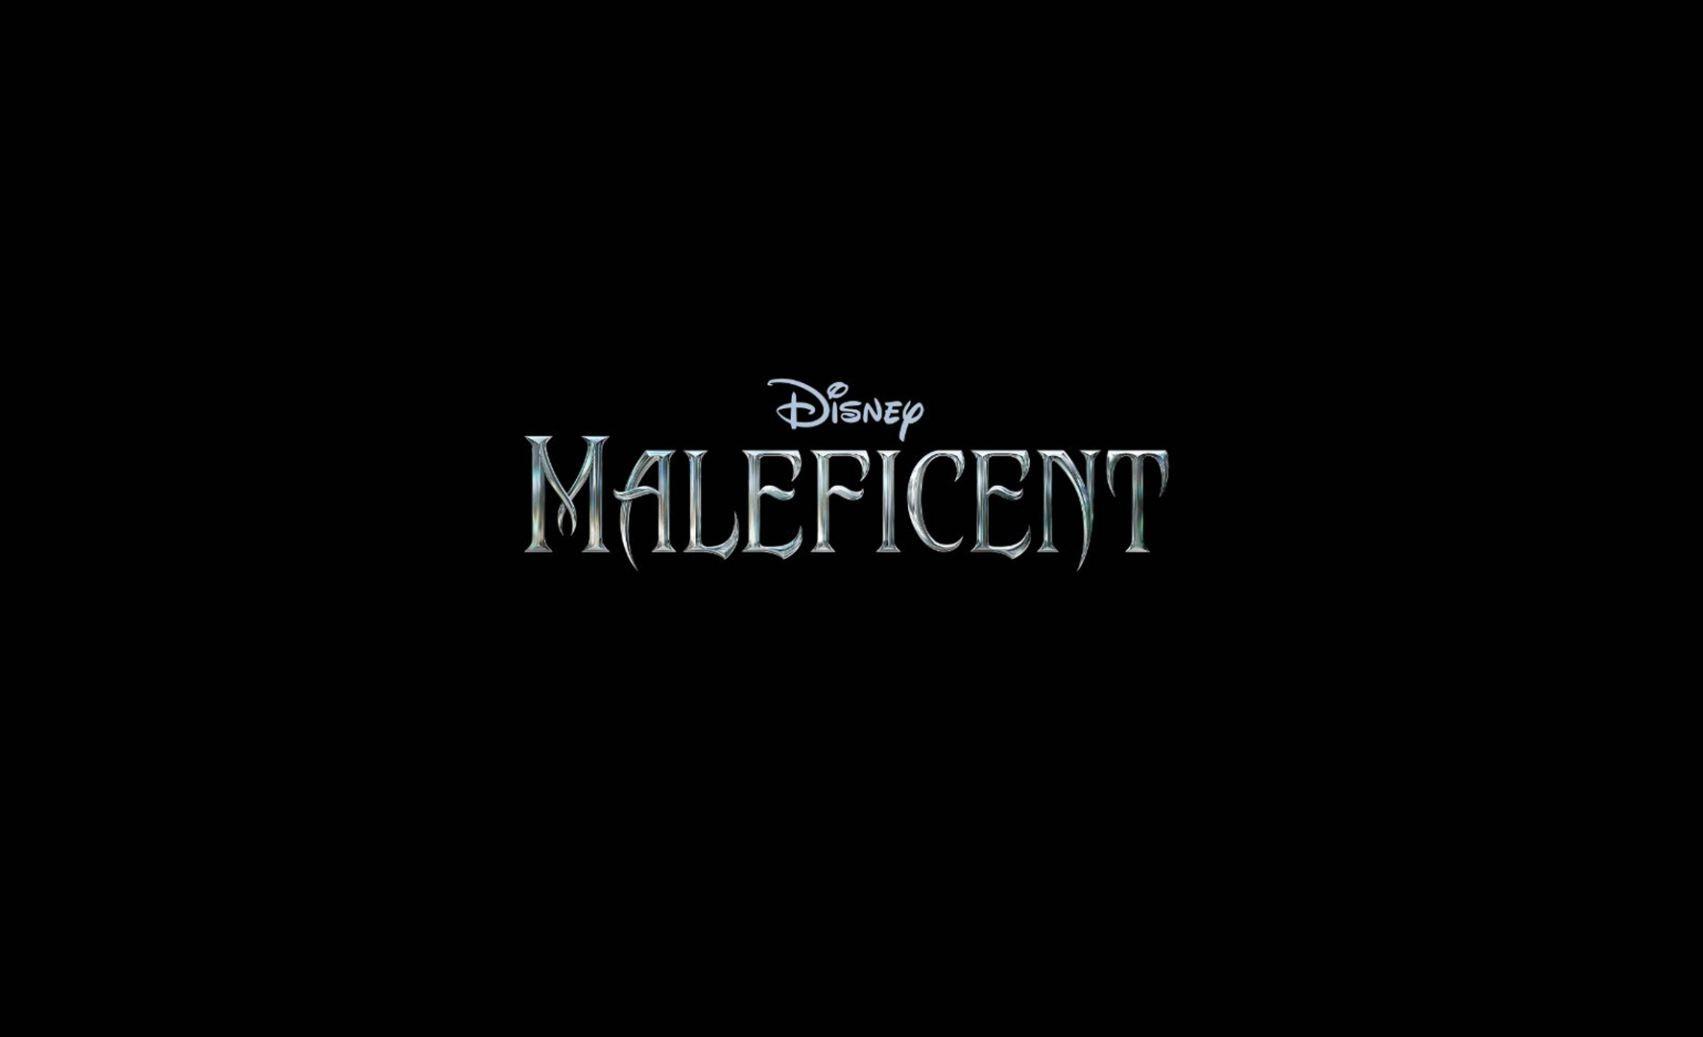 Minimalistic Maleficent Logo Black Background Wallpaper